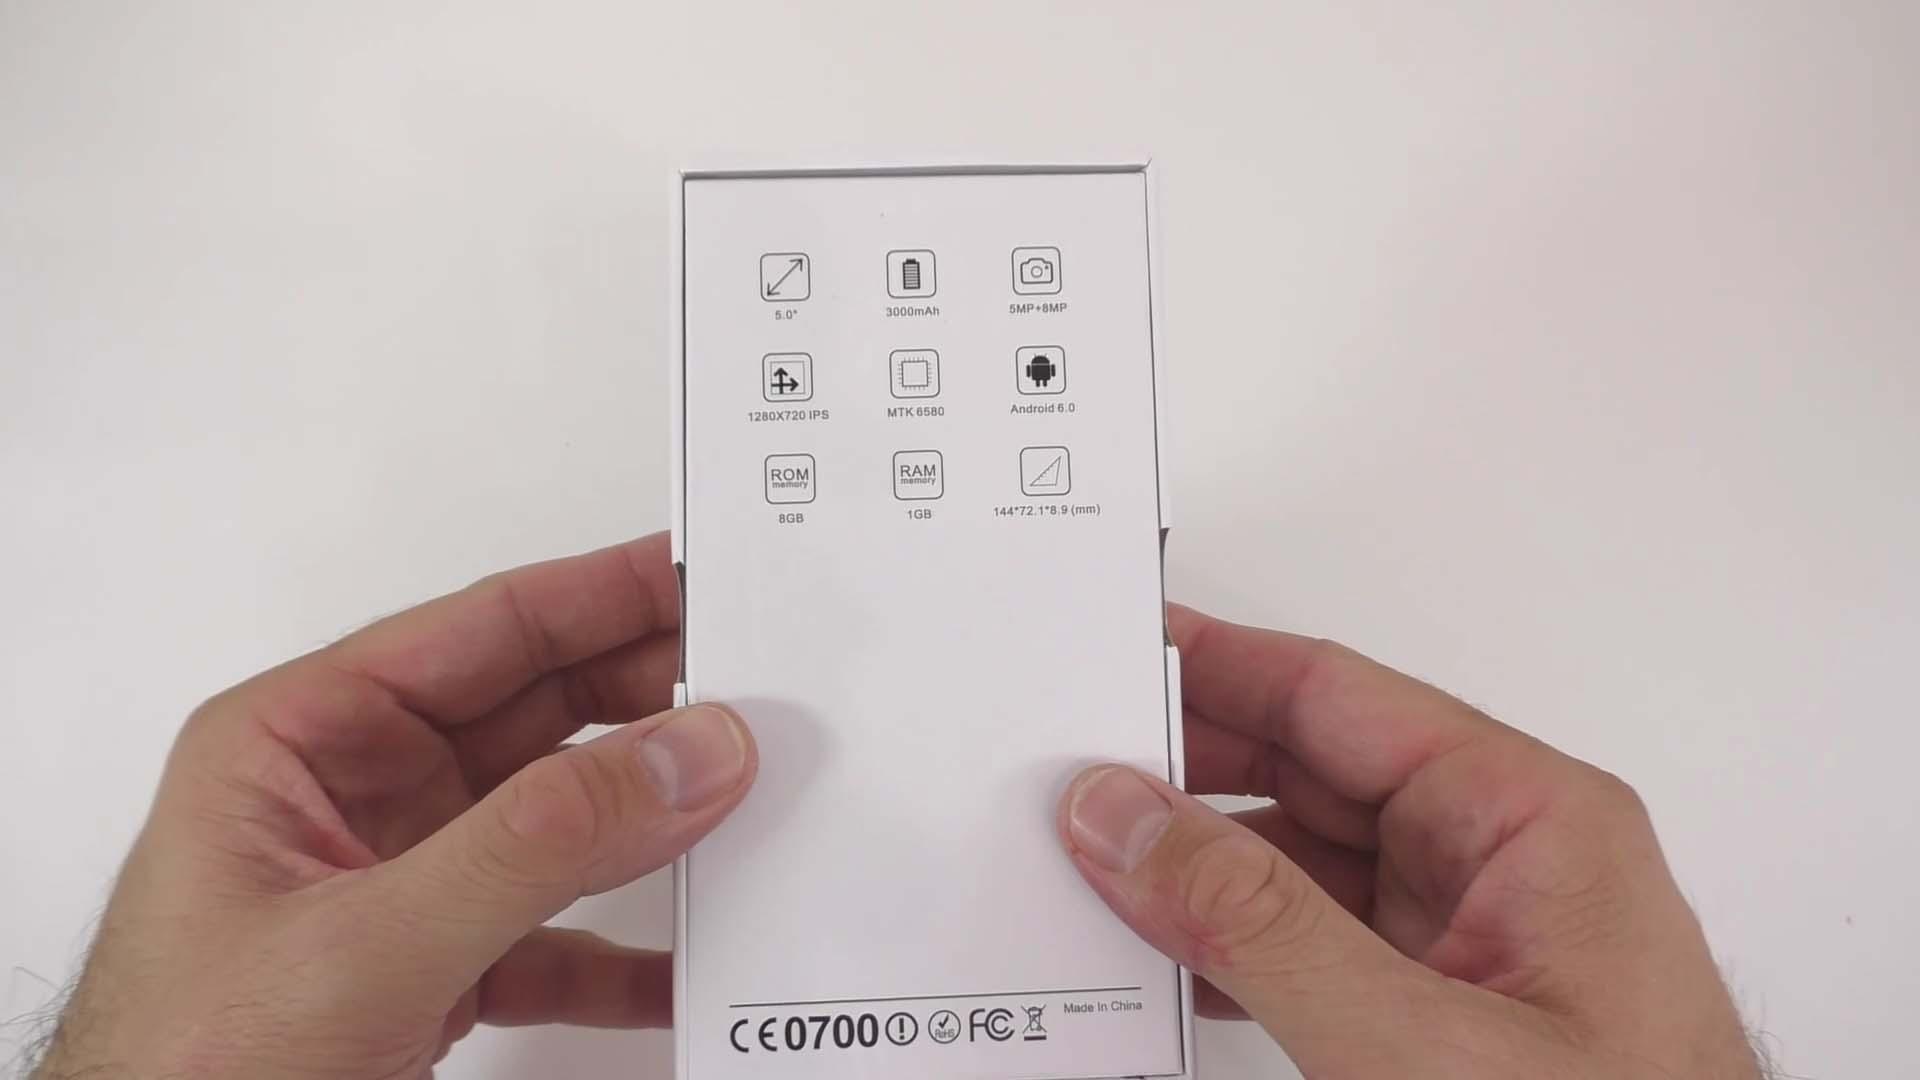 Basic Smartphone